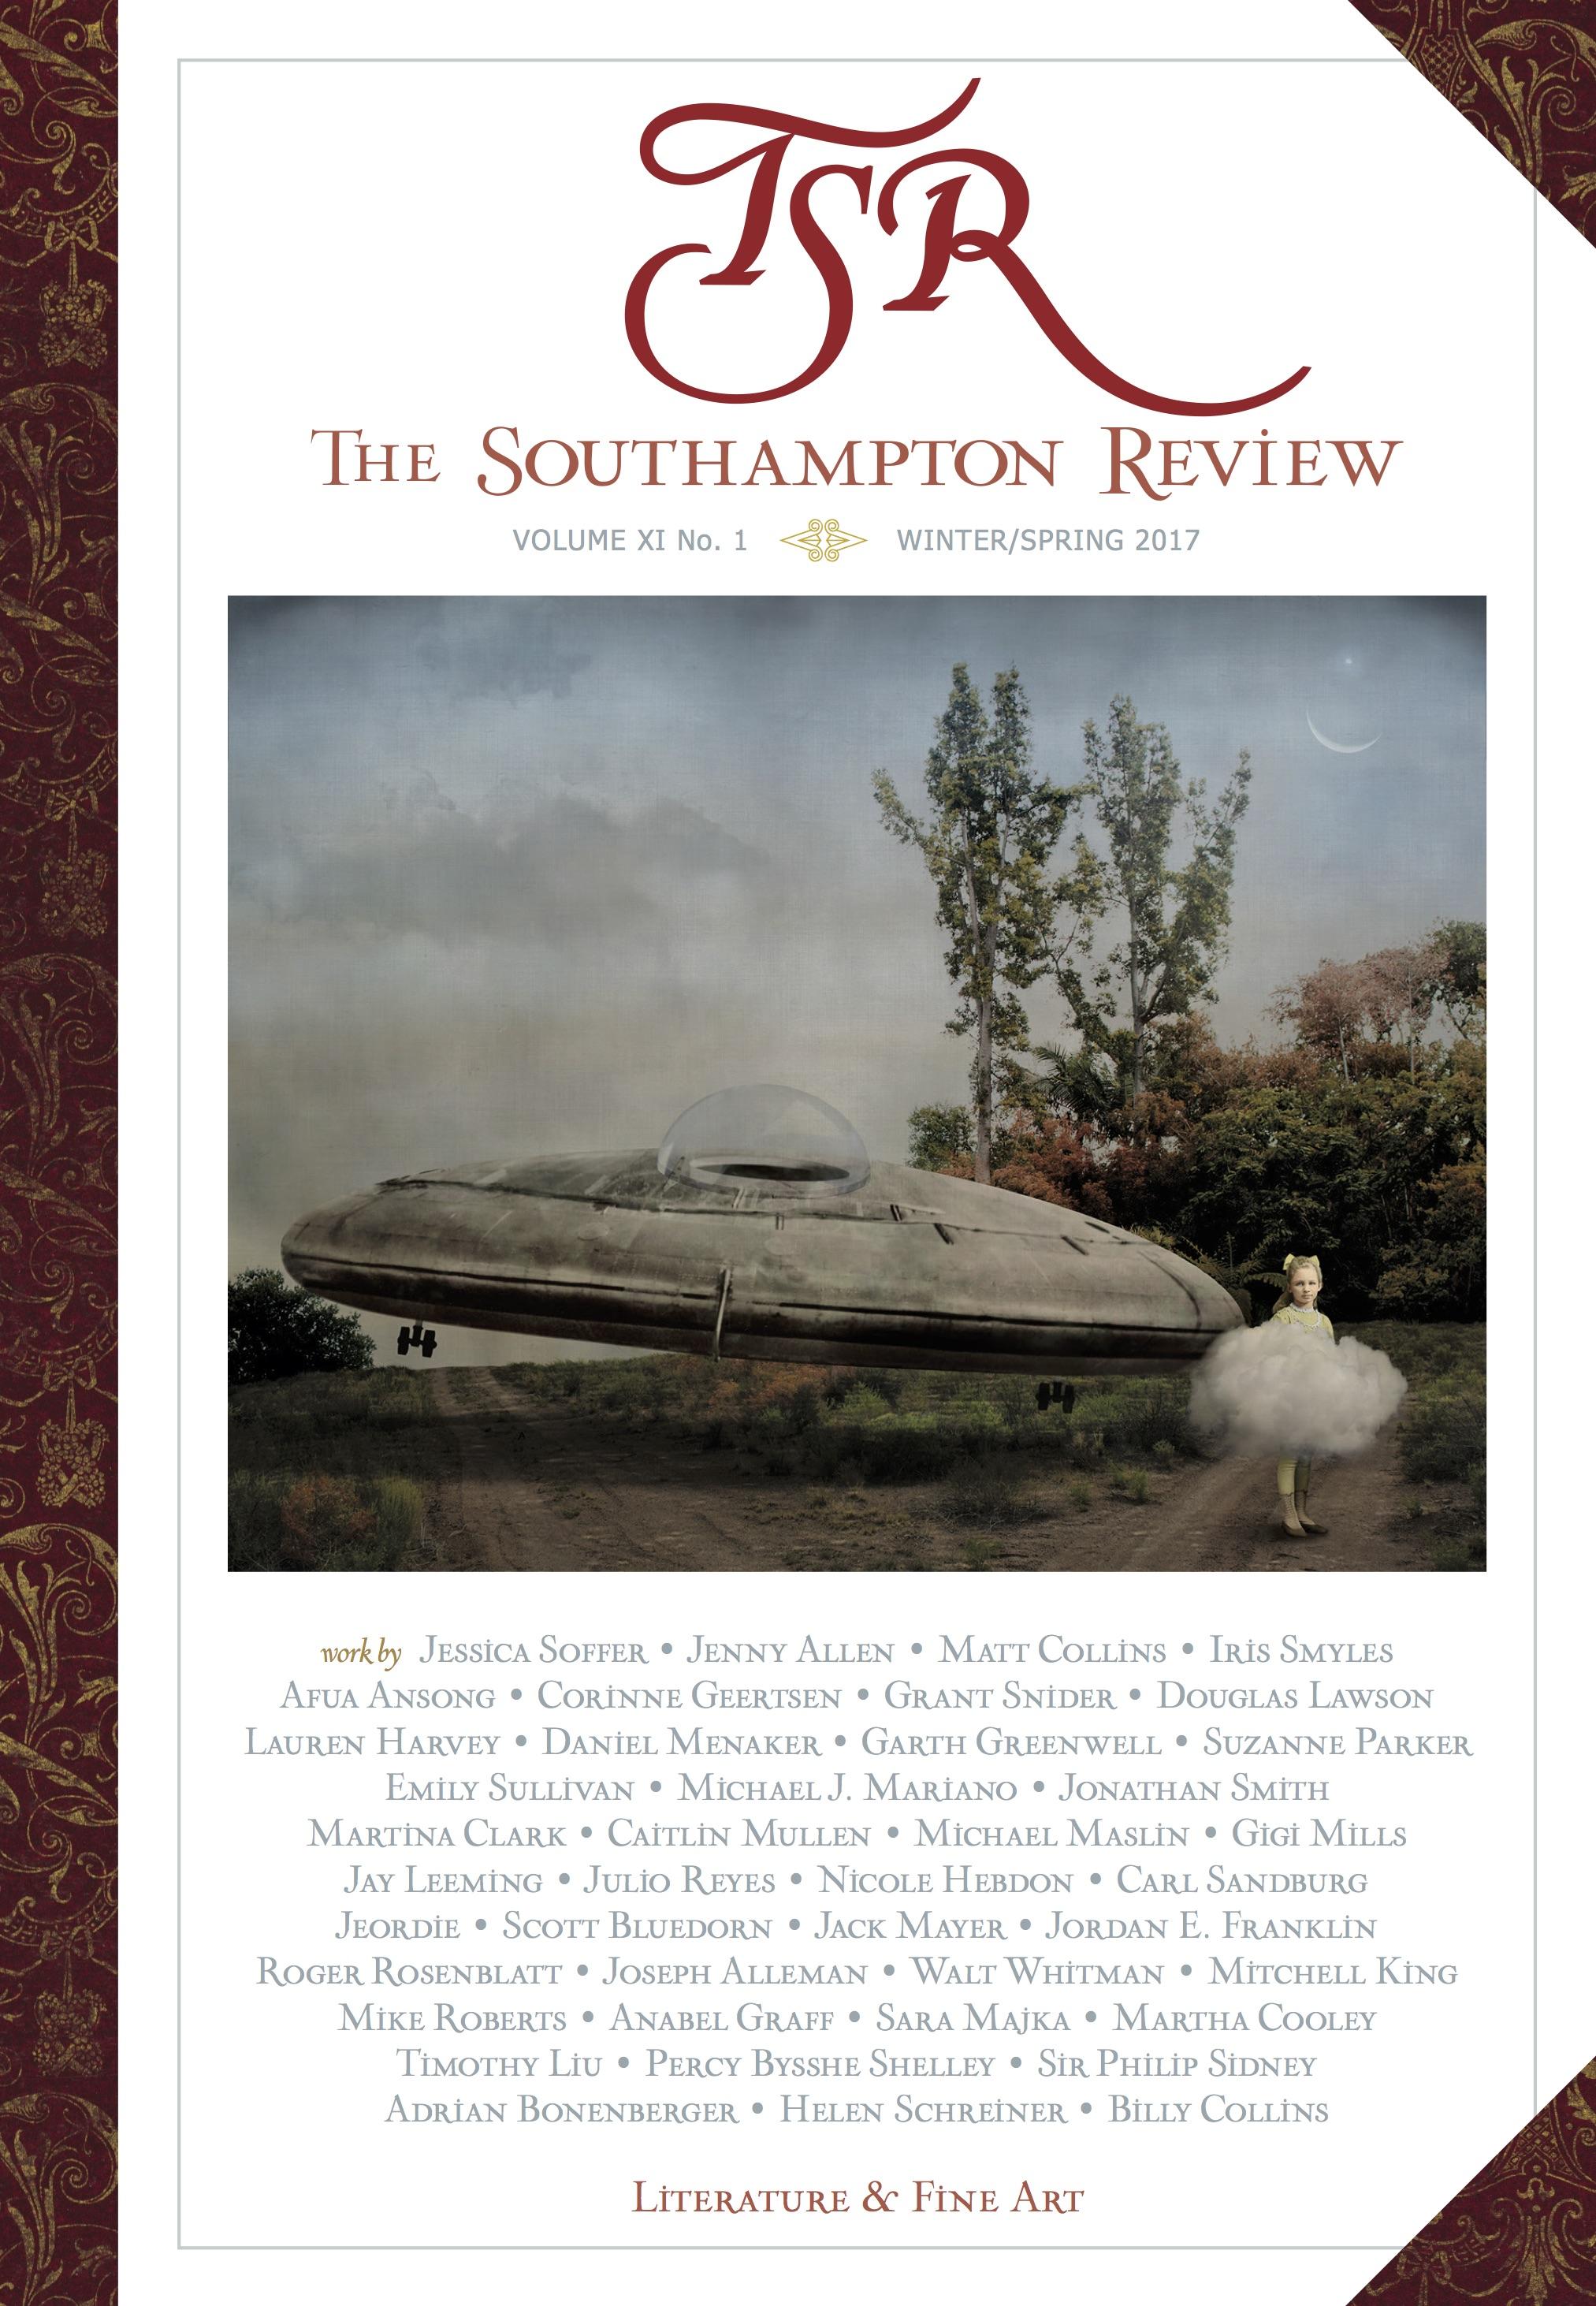 TSR WS 2017 COVER.jpg